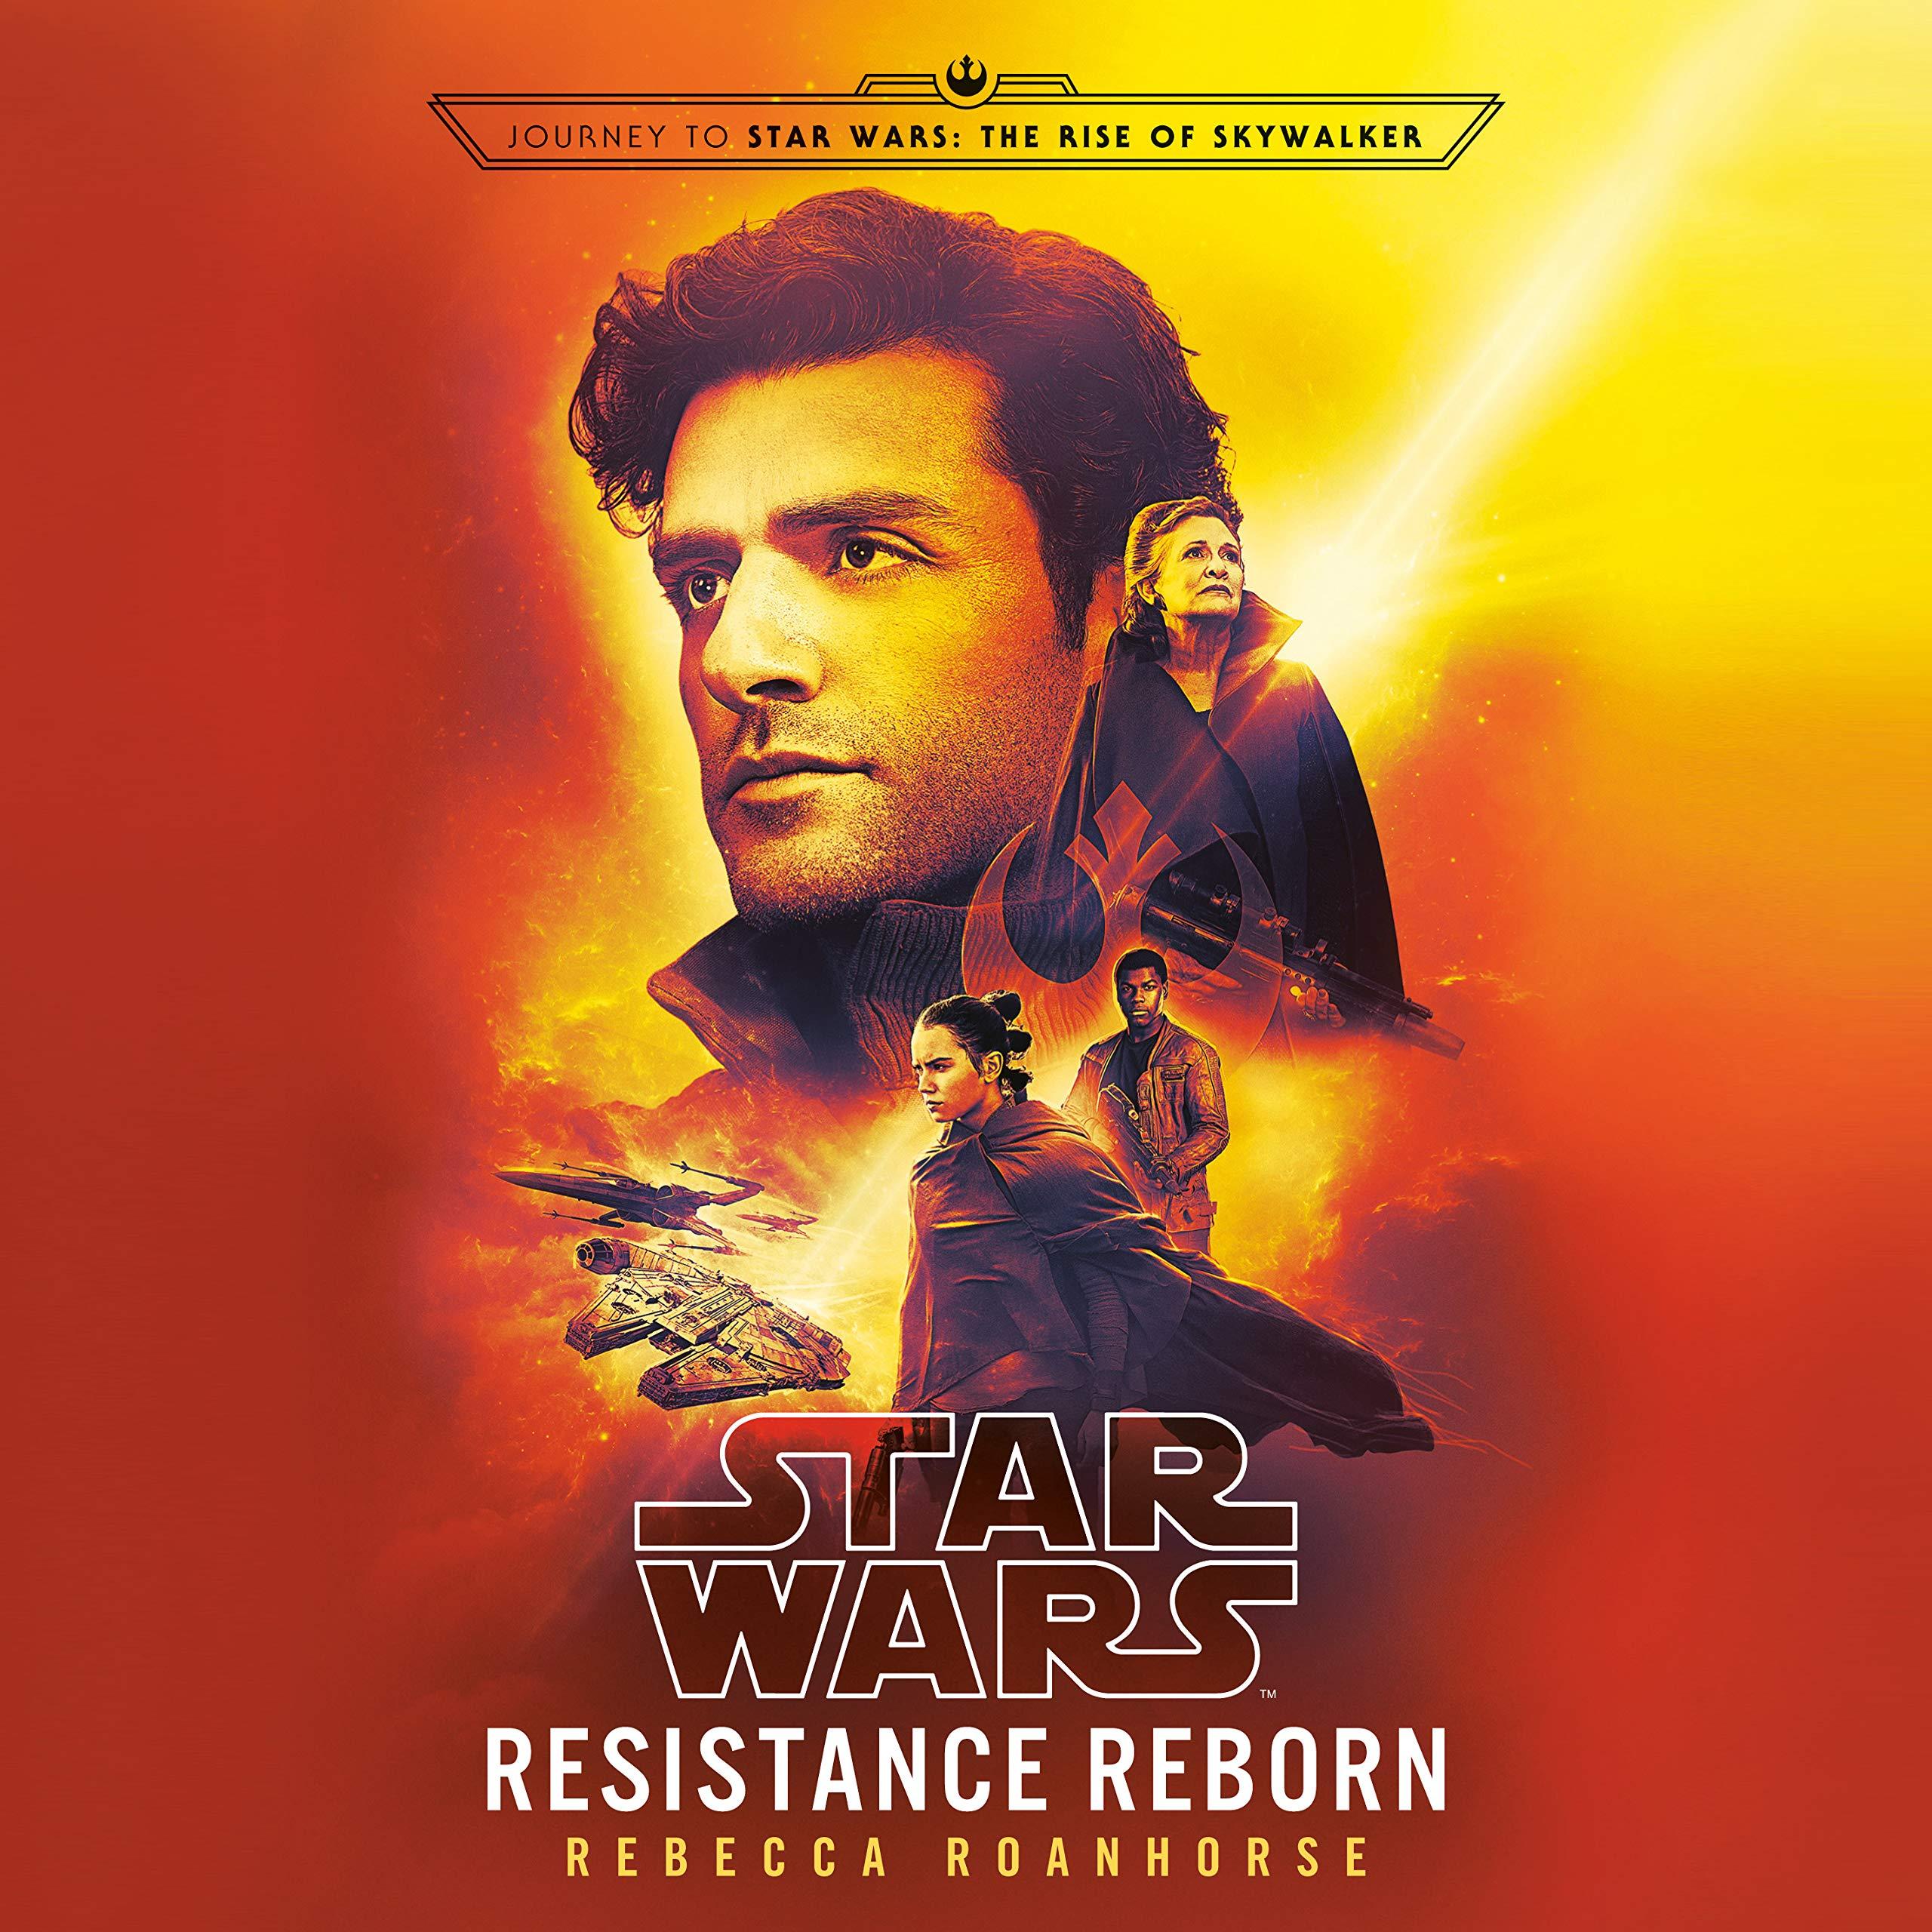 Star Wars Resistance Reborn book cover.